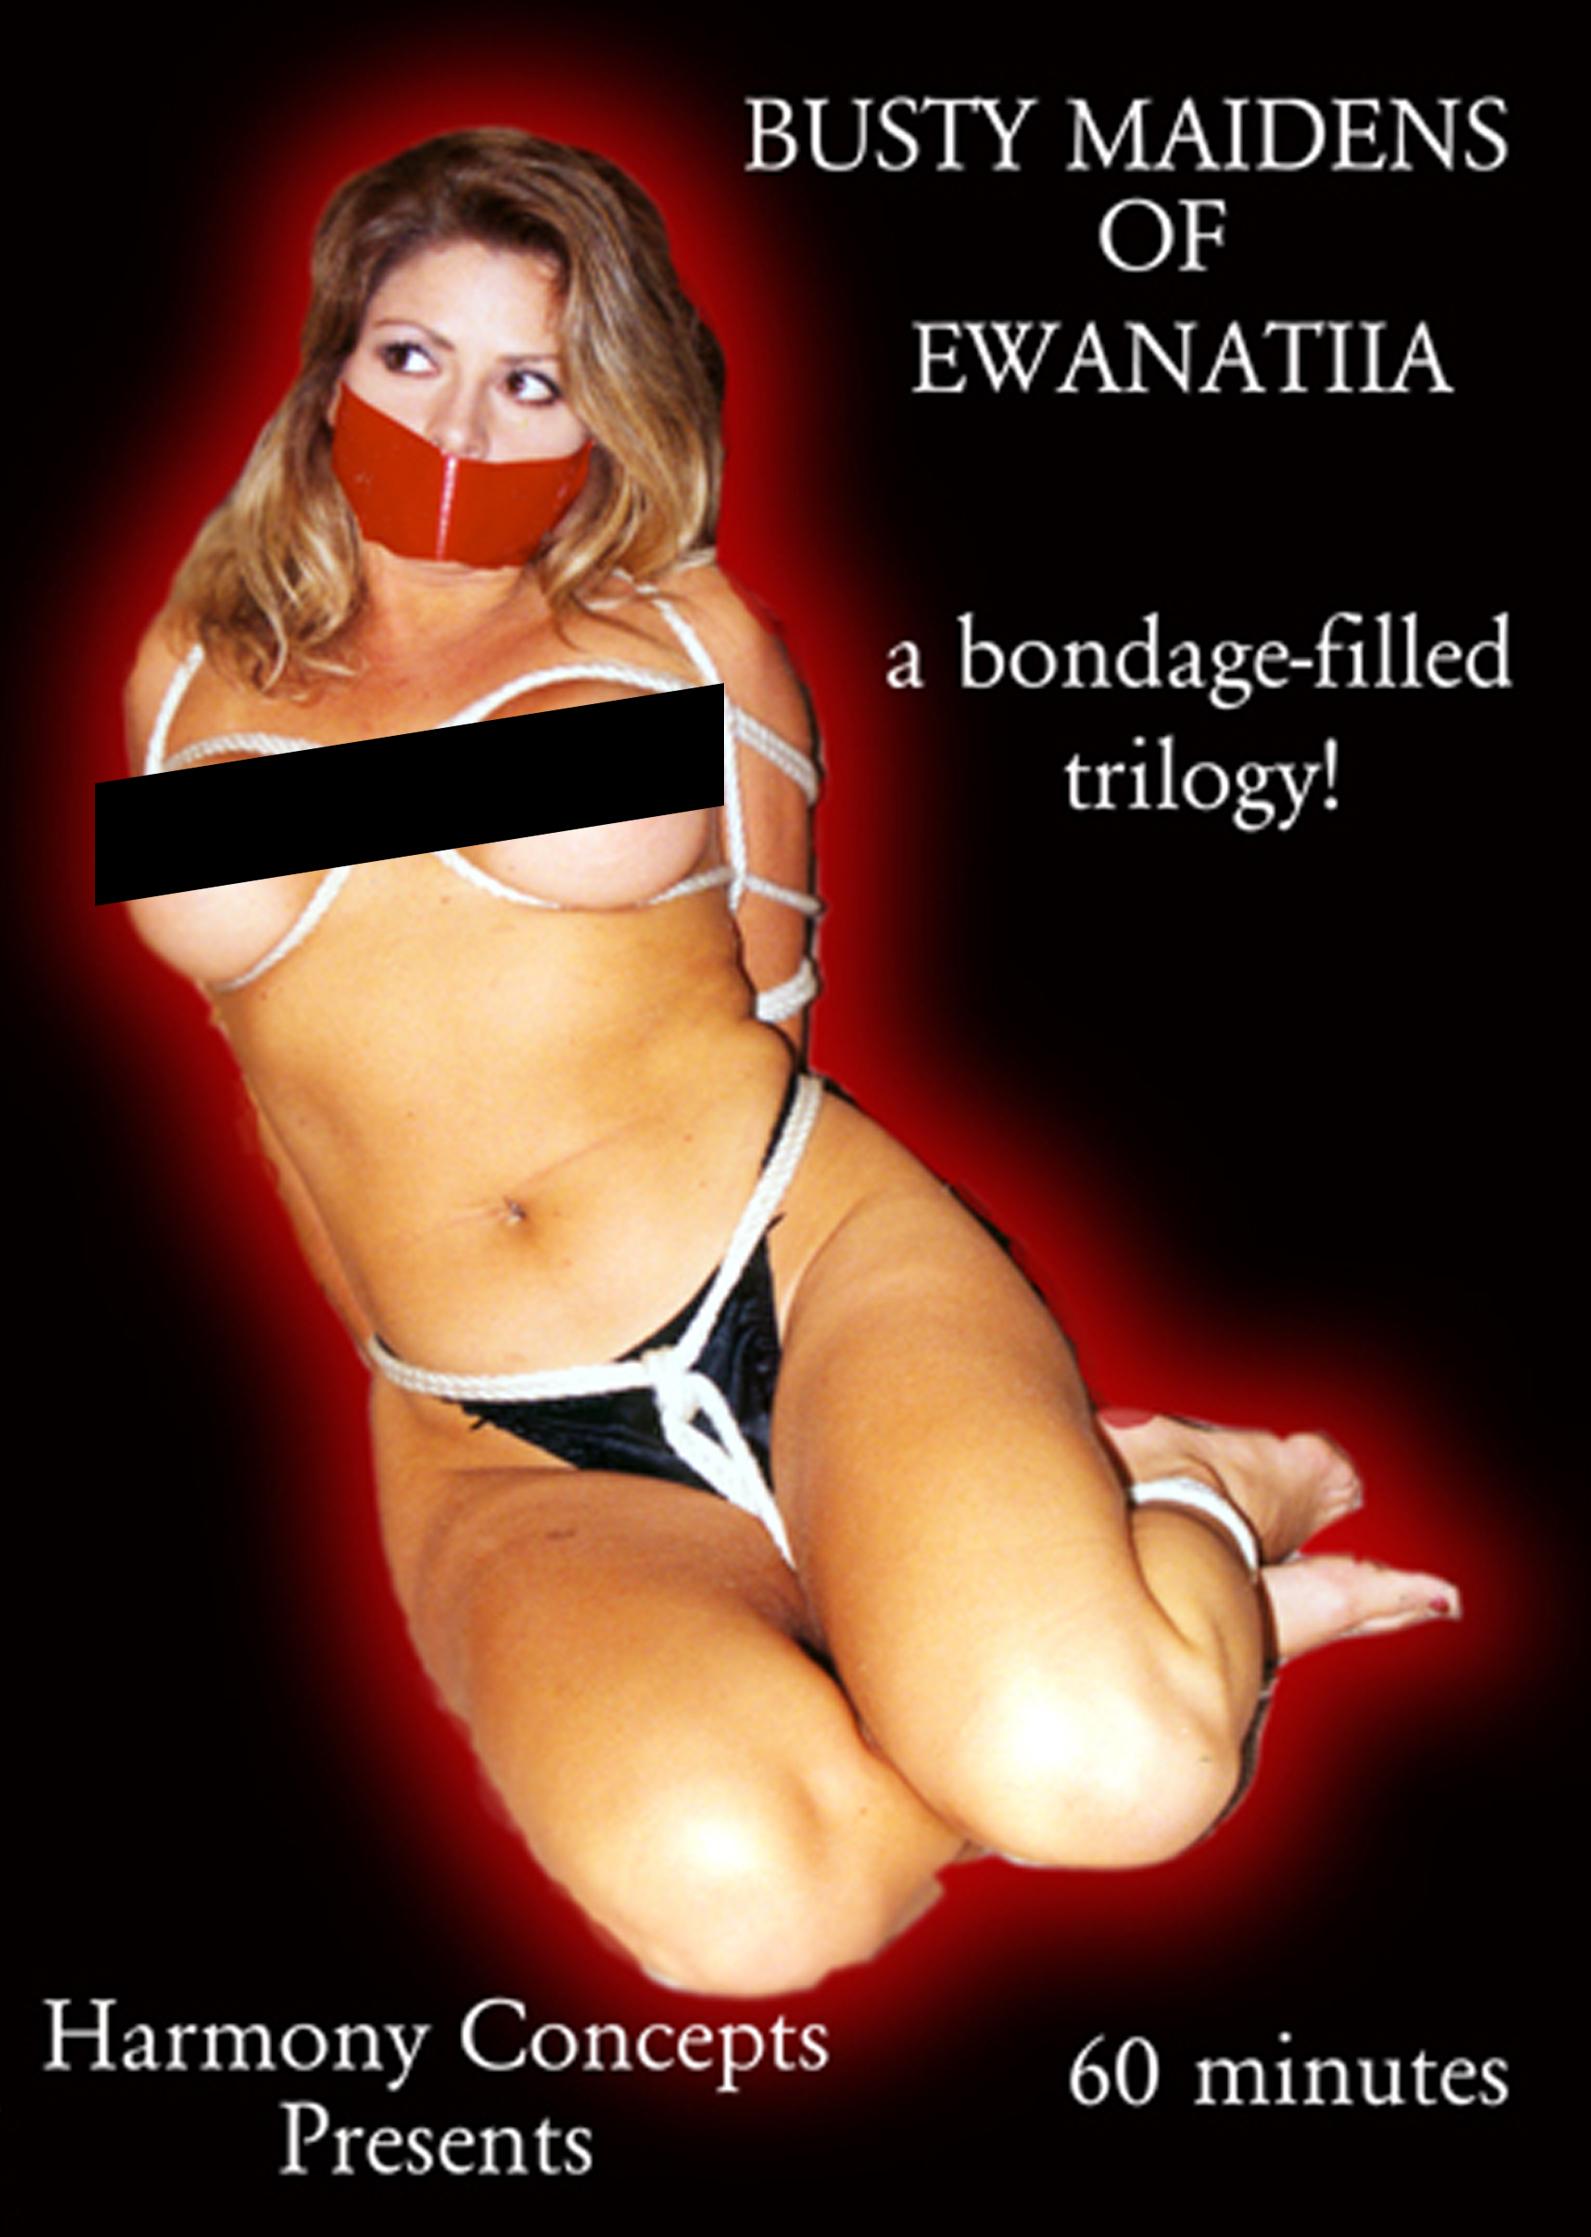 Busty Maidens of Ewanatiia